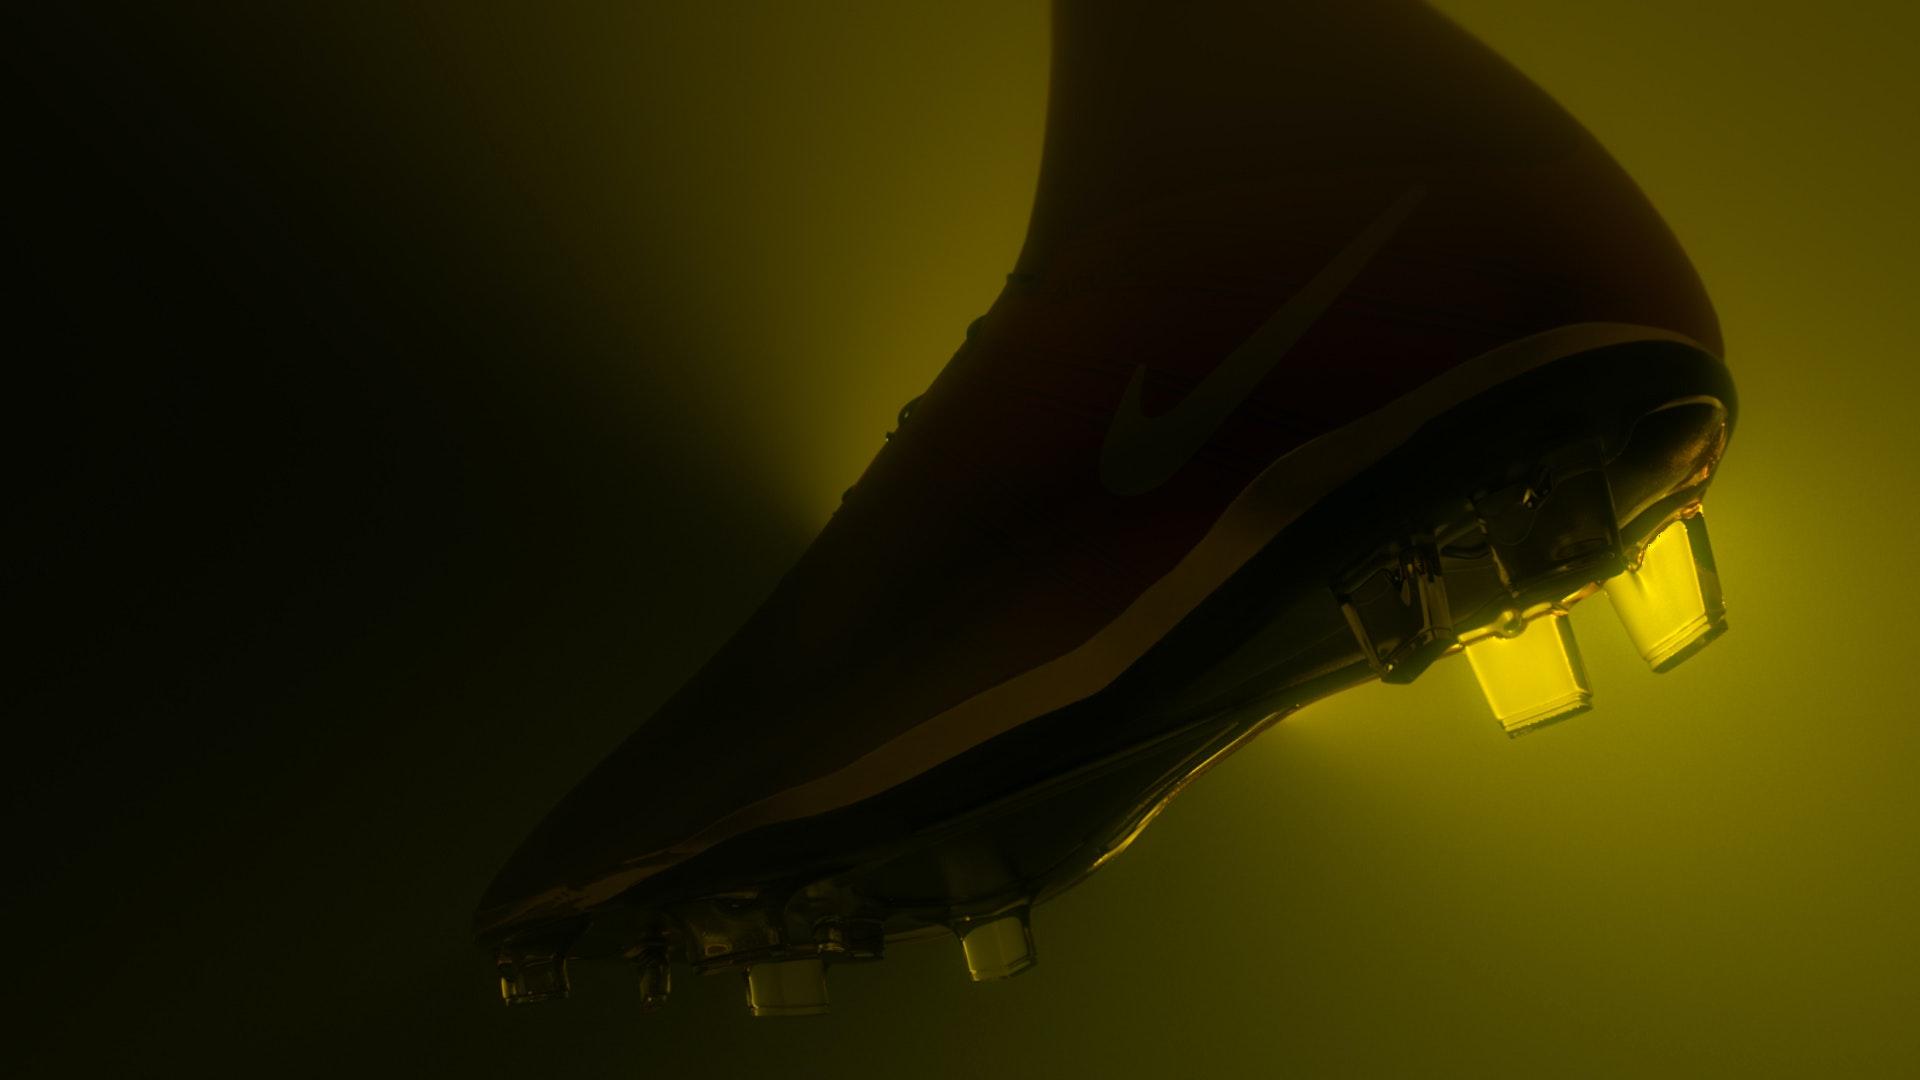 VINICIUS NALDI - NIKE_SpeedLab_Frame_2-(0-00-01-03)